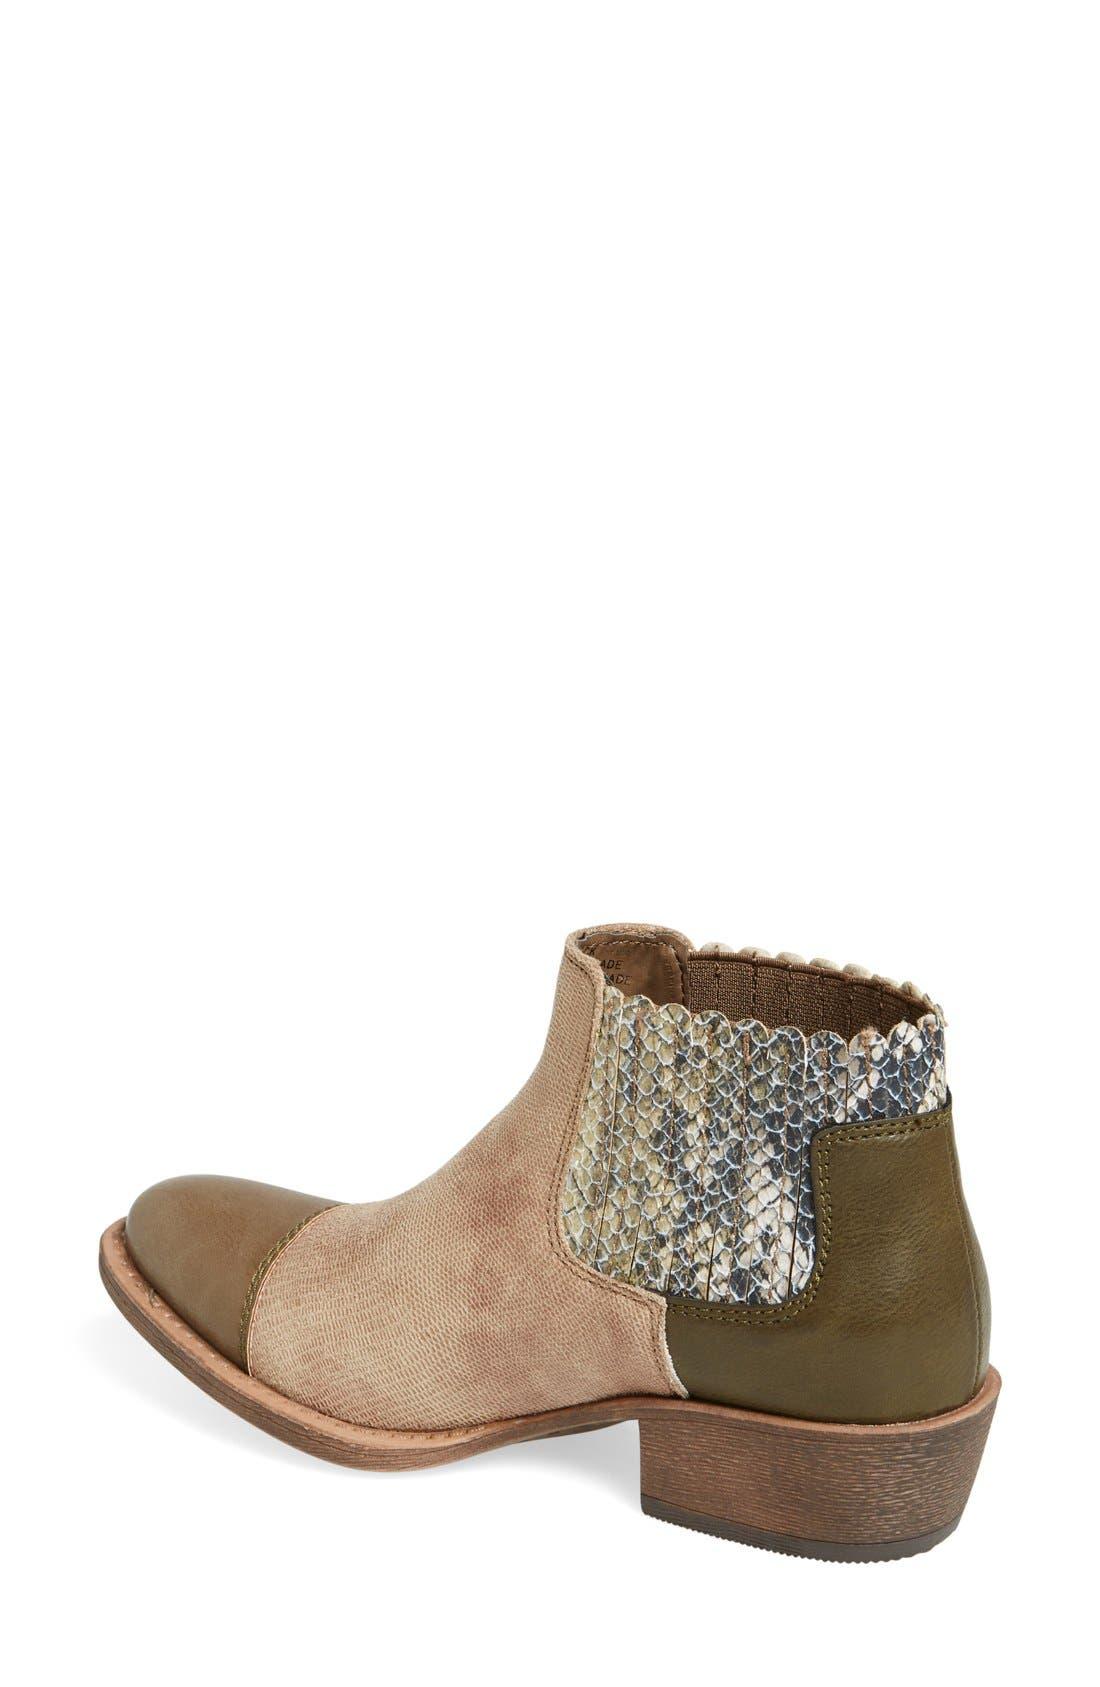 Alternate Image 2  - Coconuts by Matisse 'Blackjack' Ankle Boot (Women)